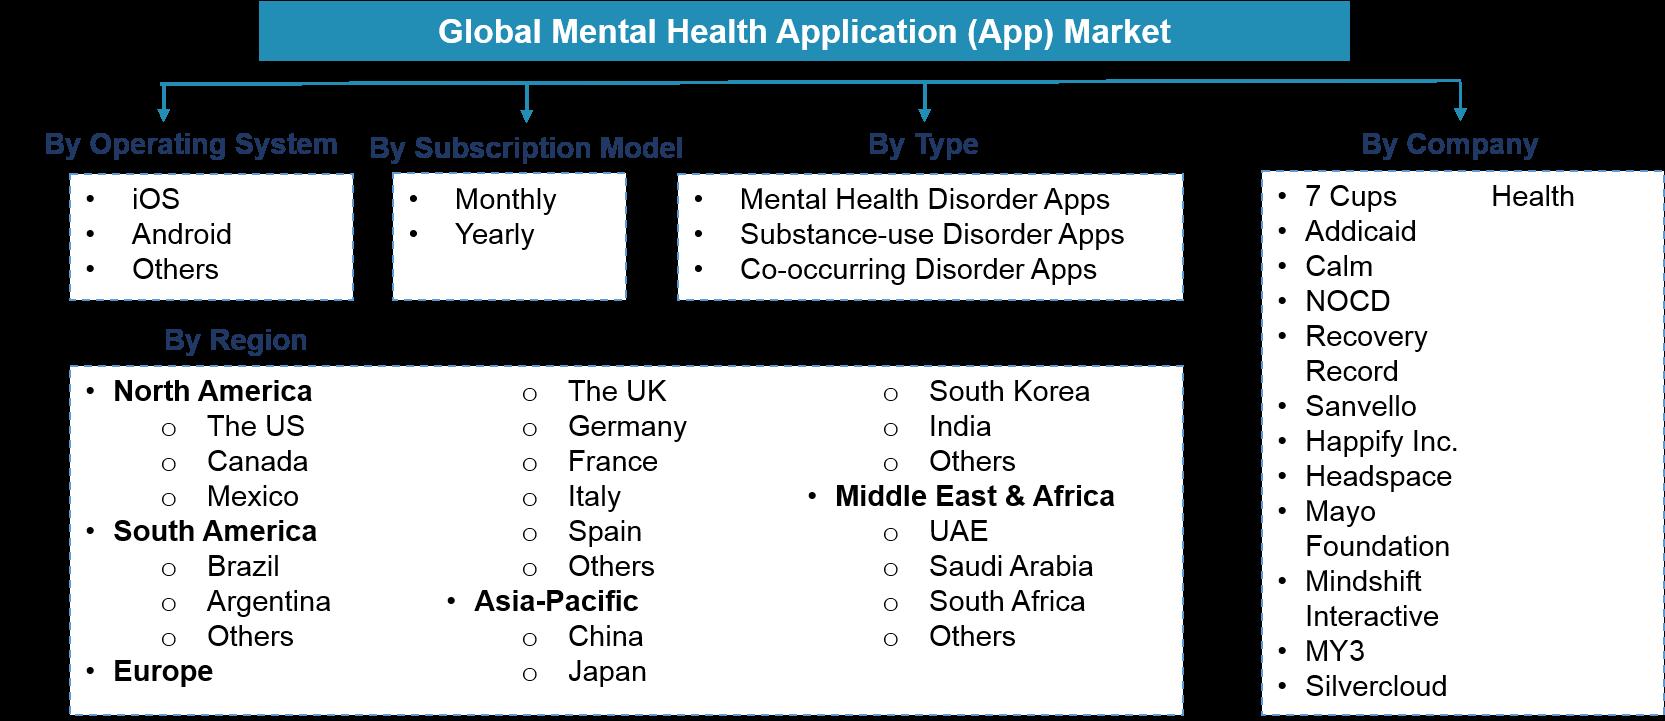 Global Mental Health Application Market Segmentation